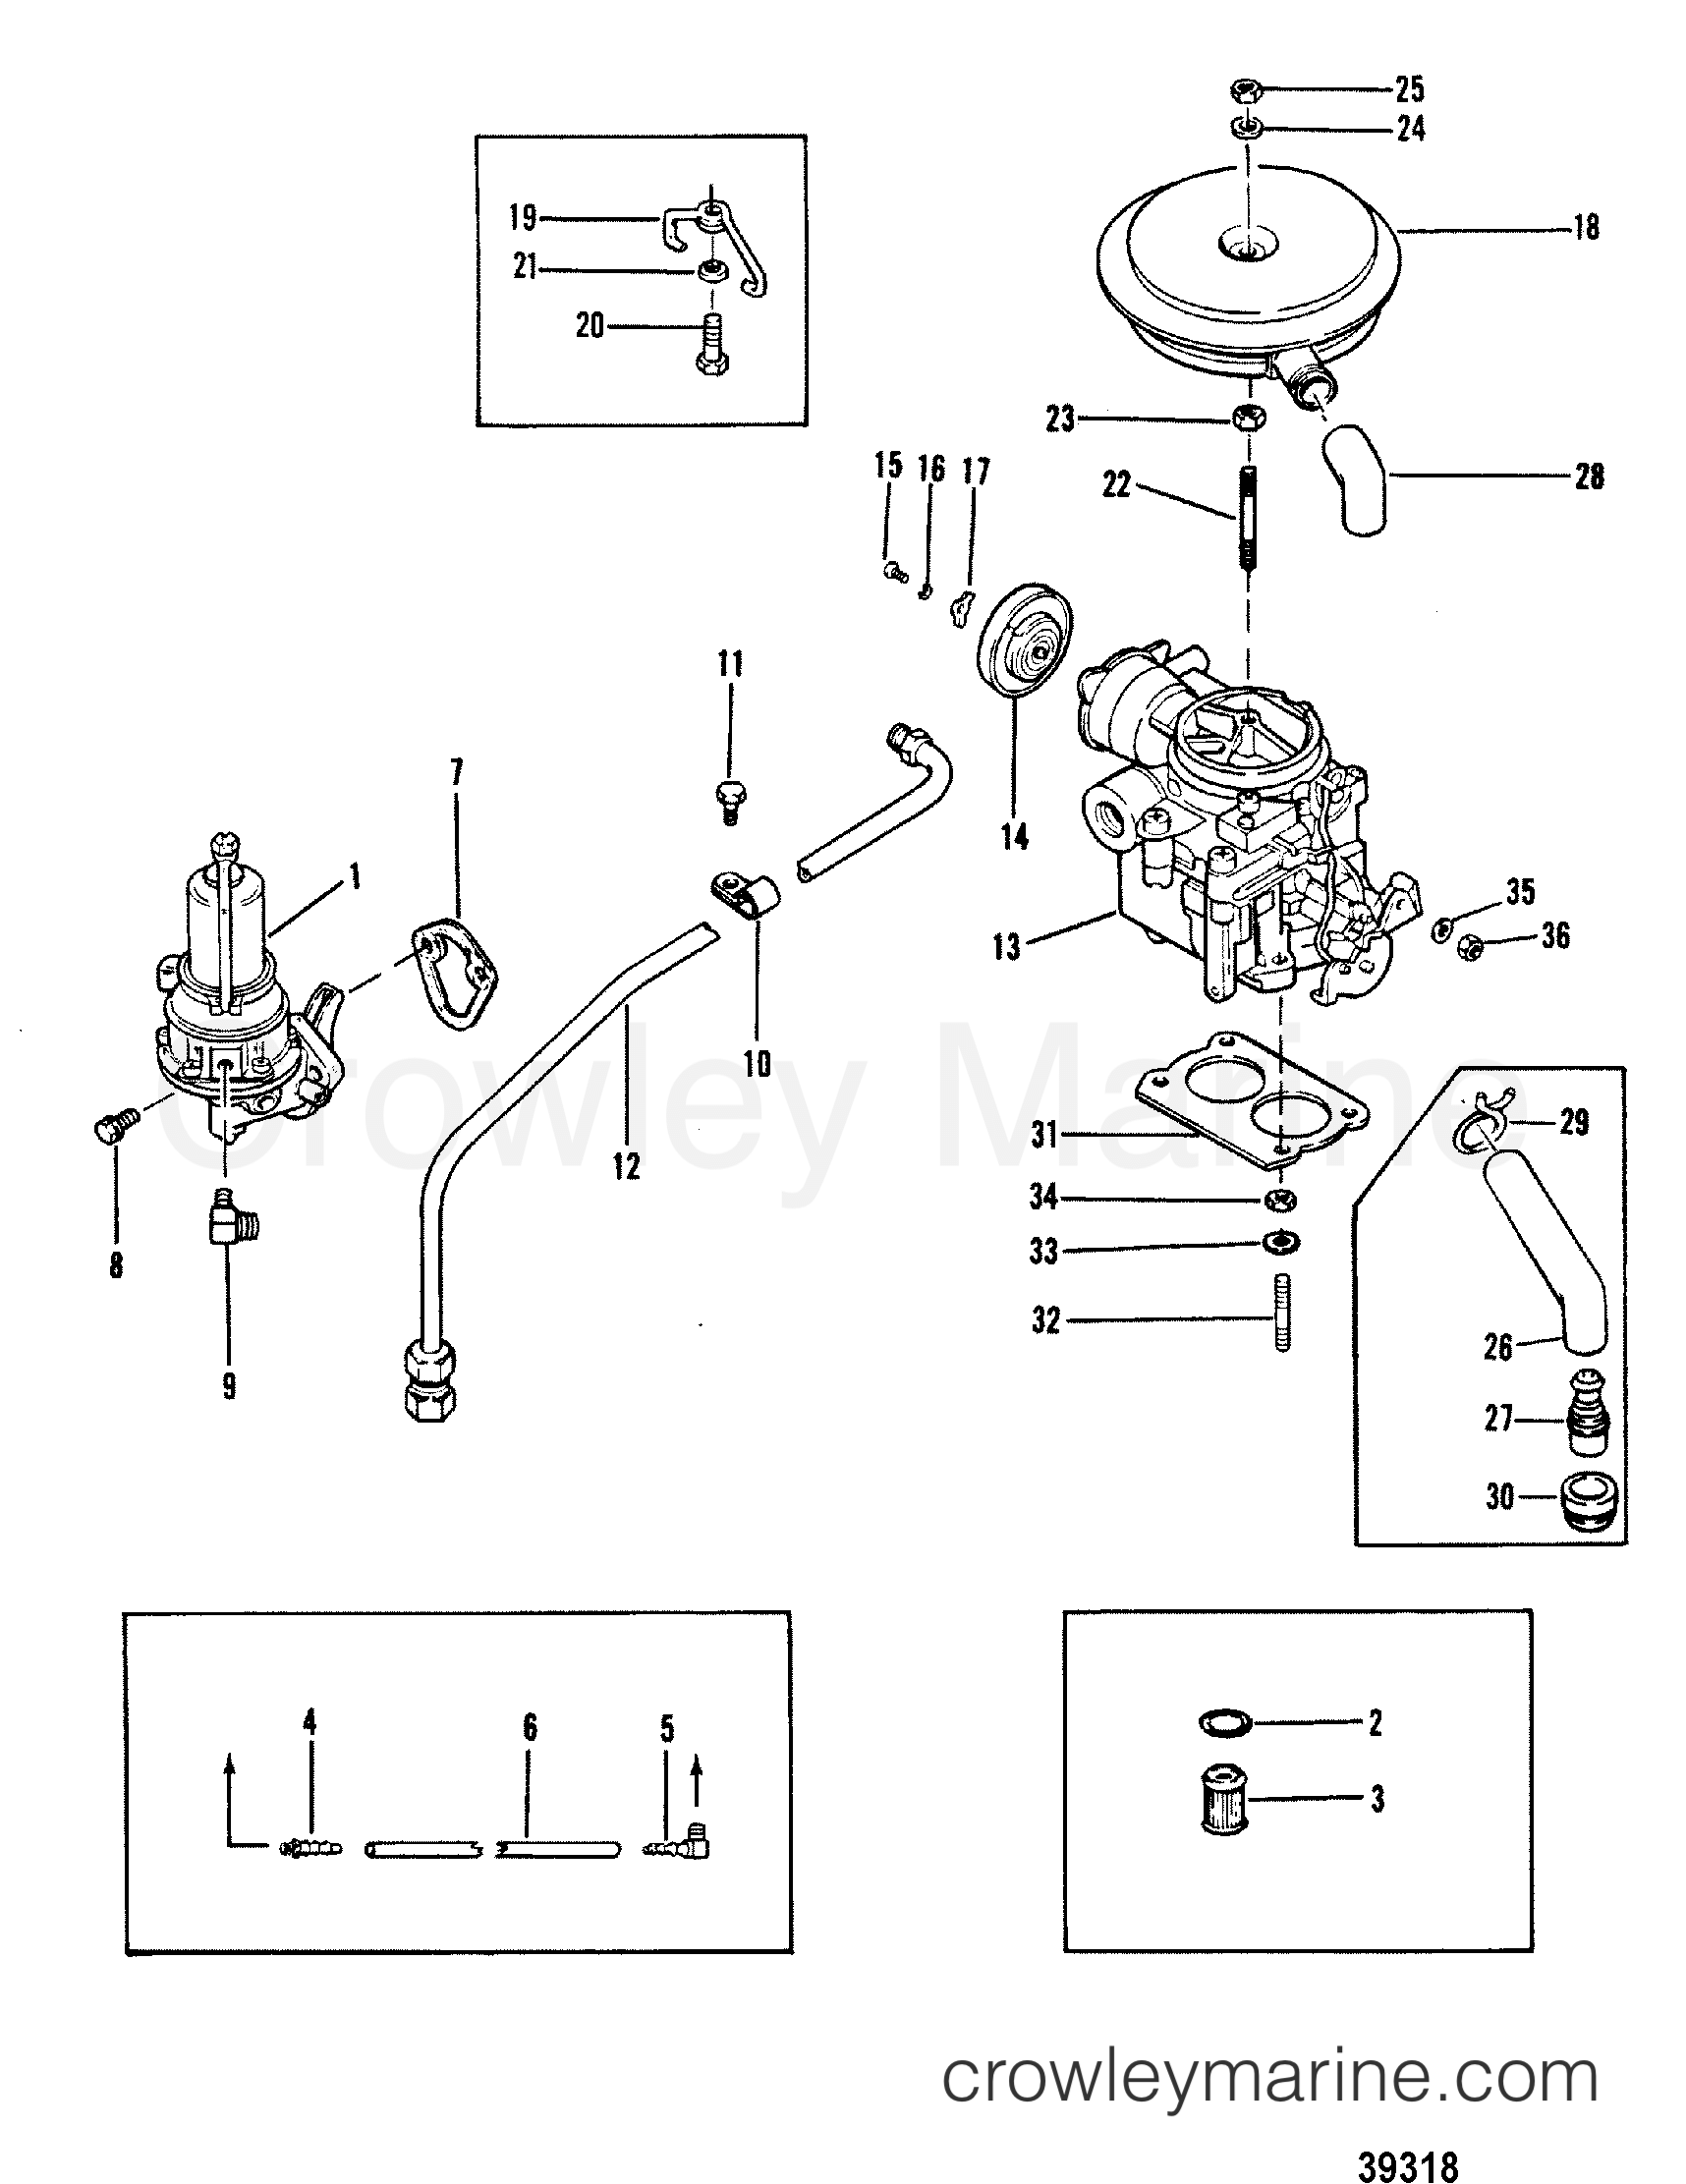 fuel pump and carburetor old design